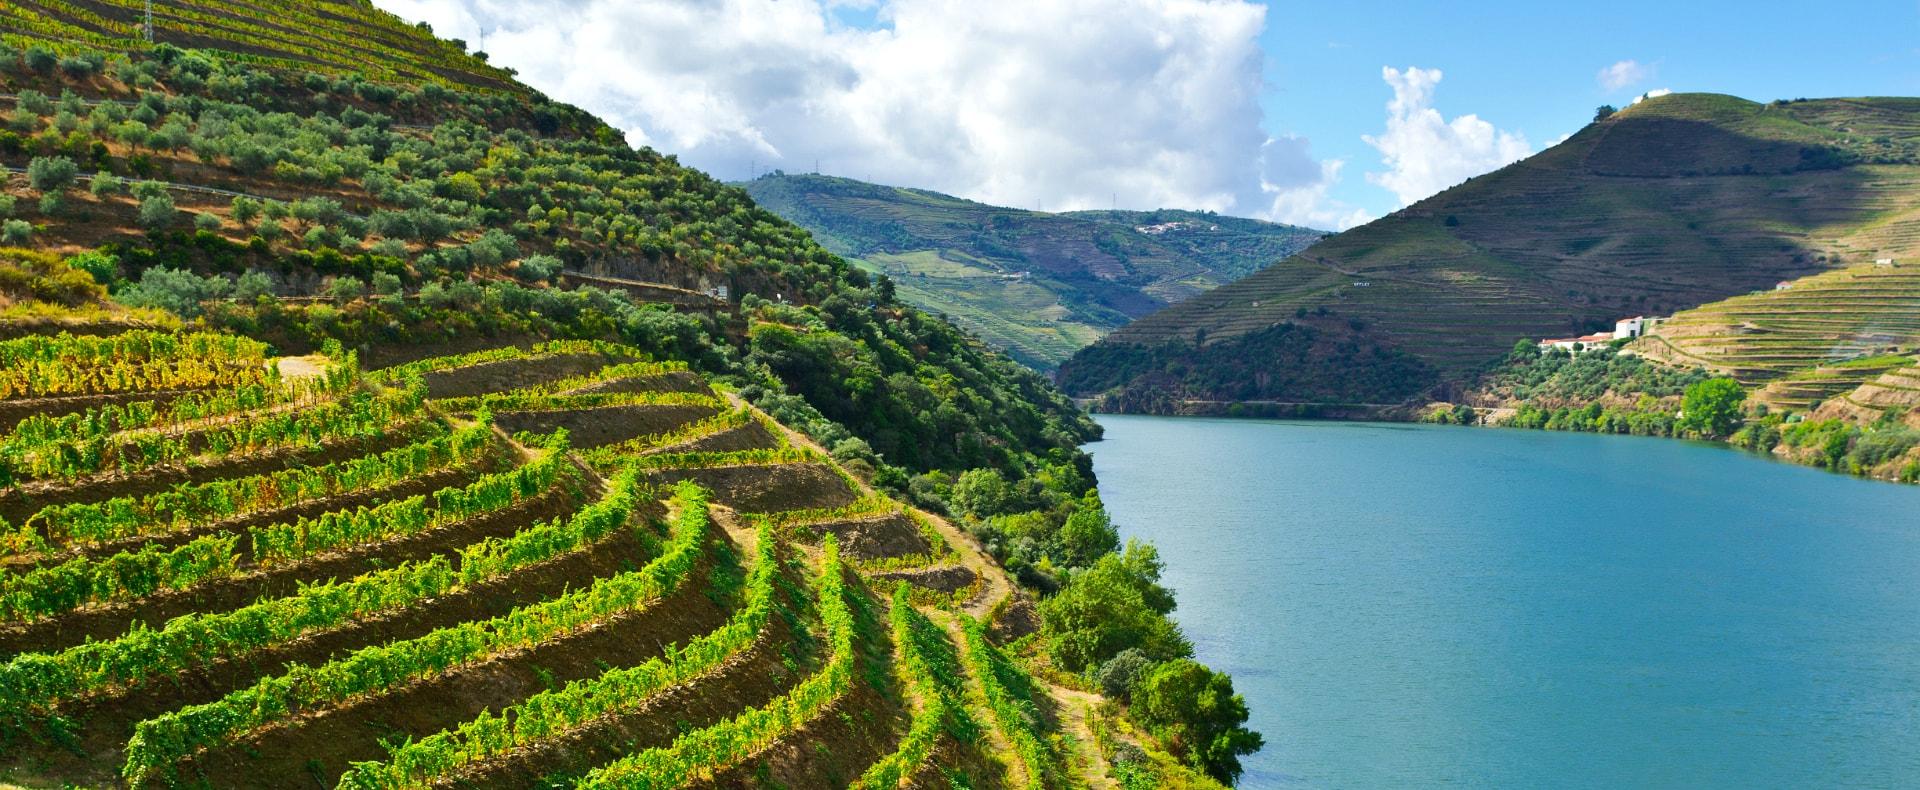 Douro Valley, Portugal